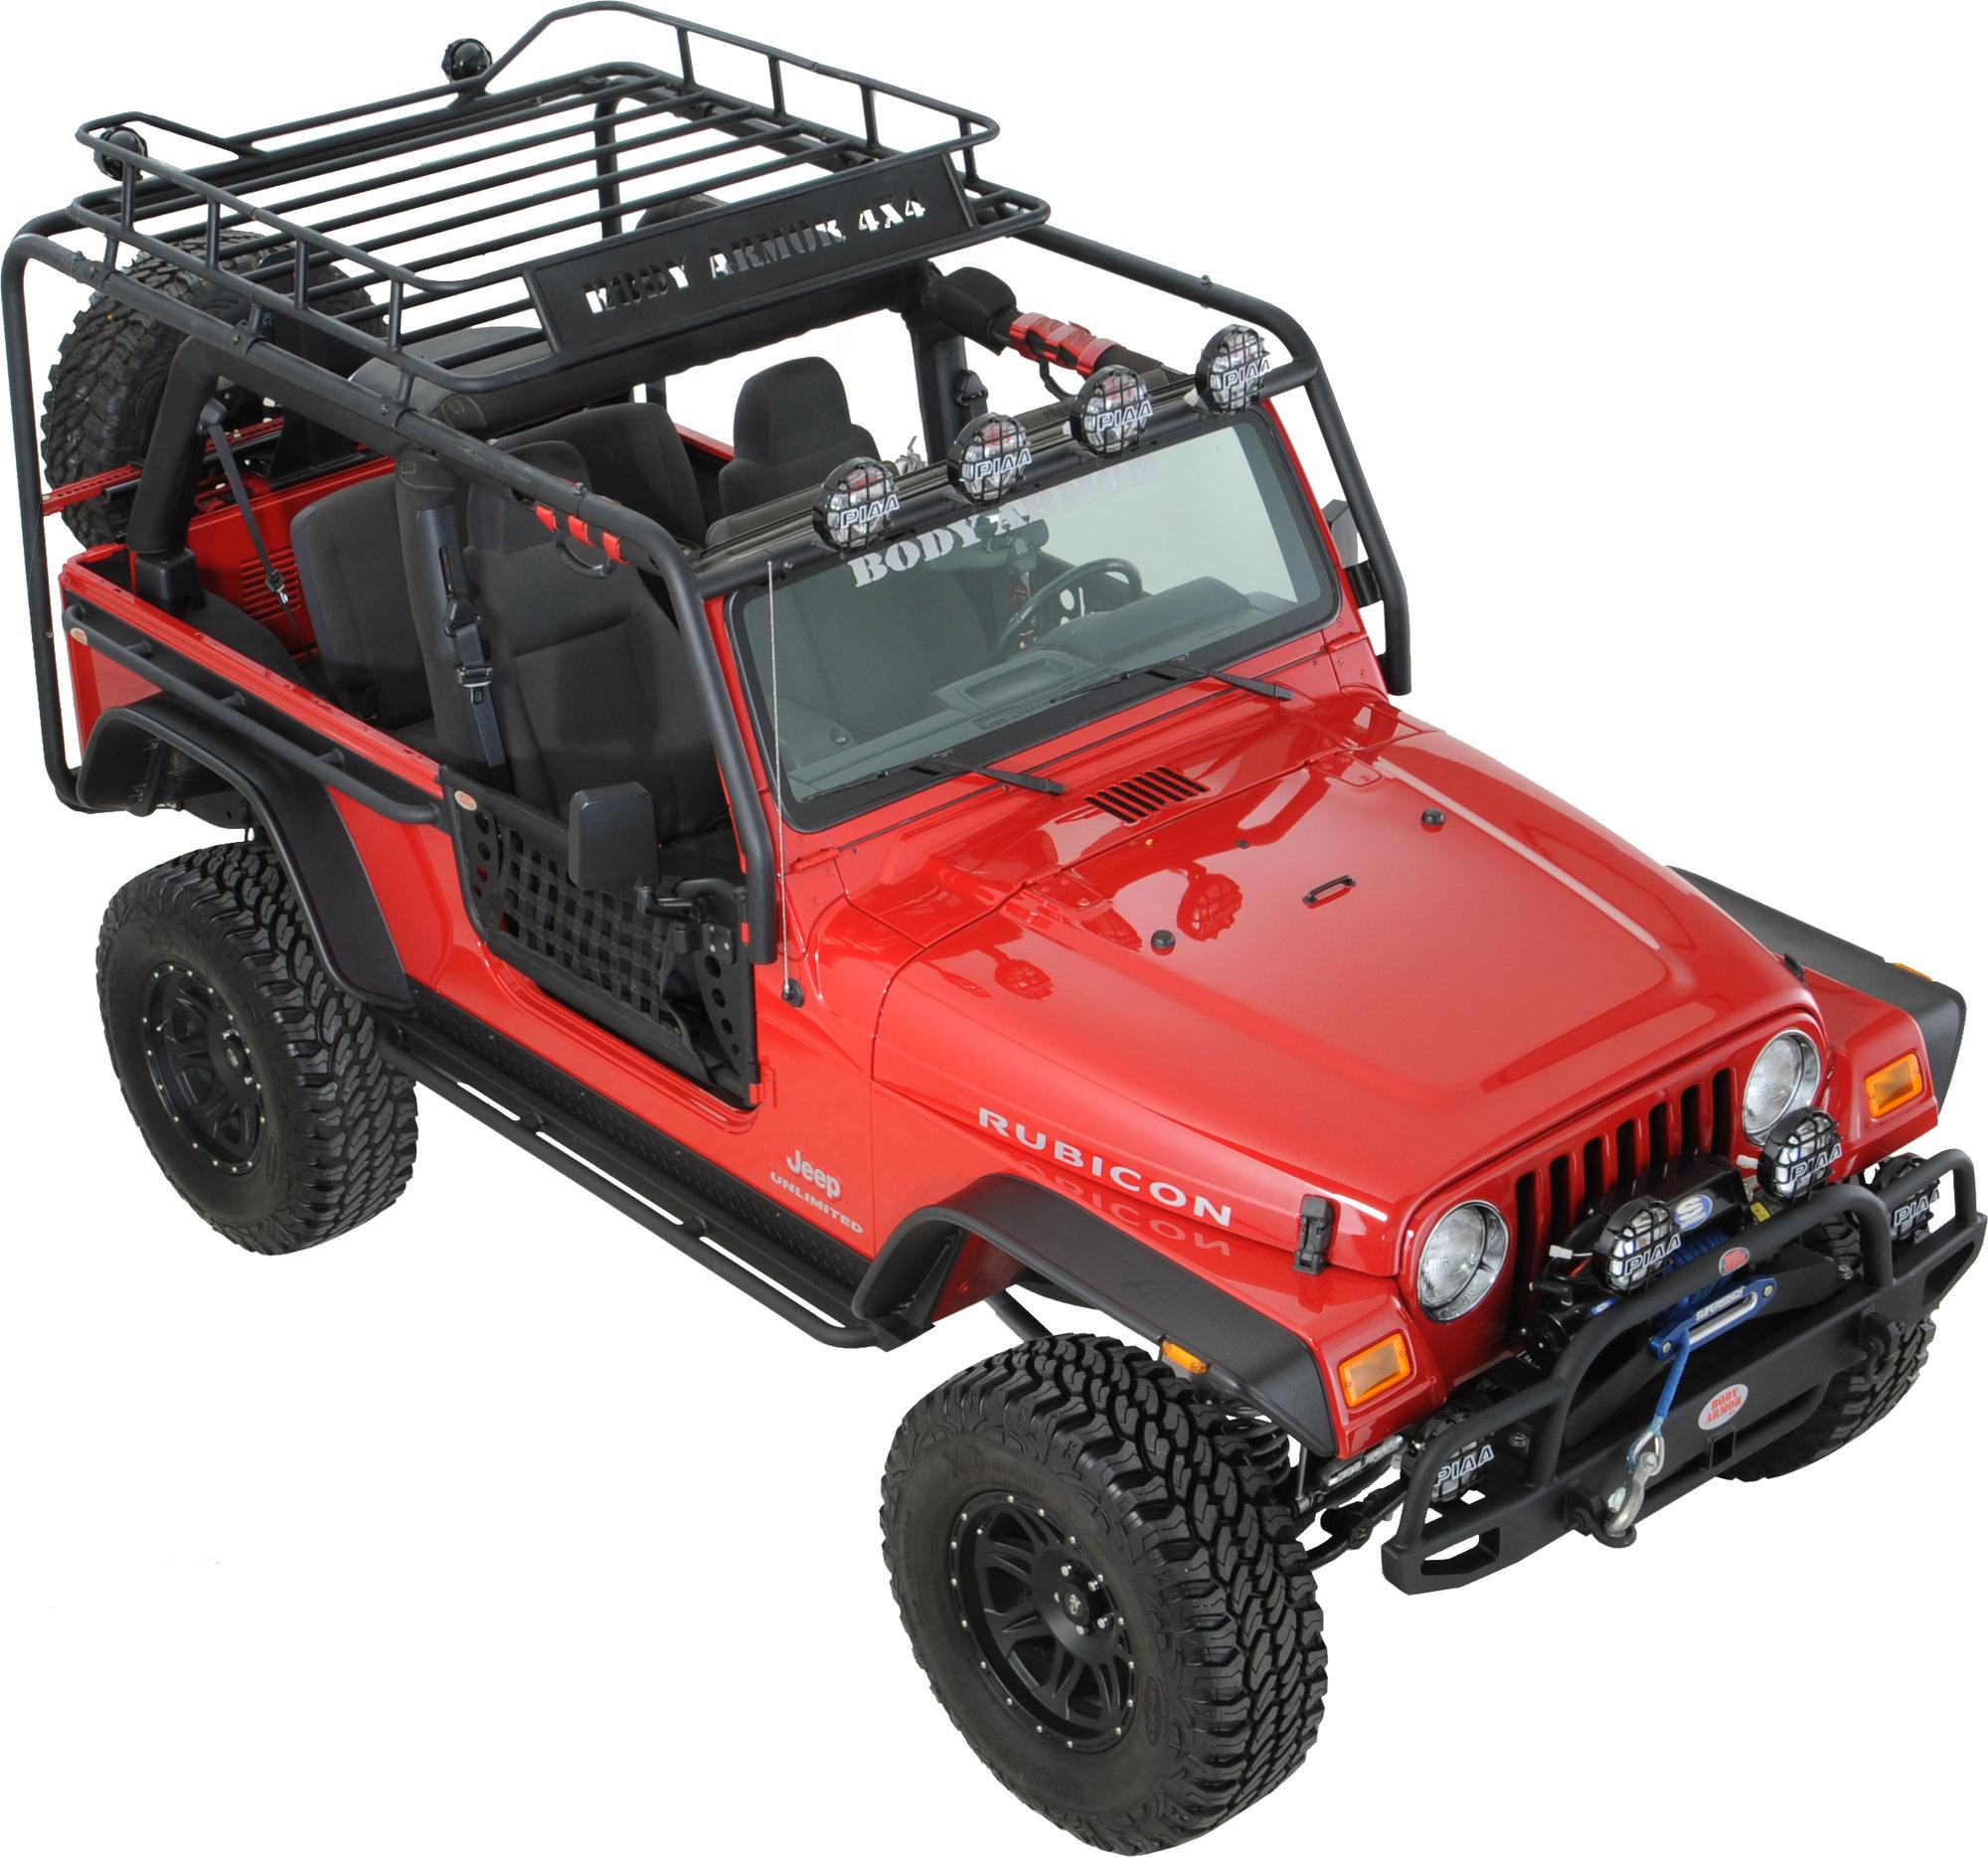 body armor tj 6125 roof rack base kit for 97 06 jeep wrangler tj